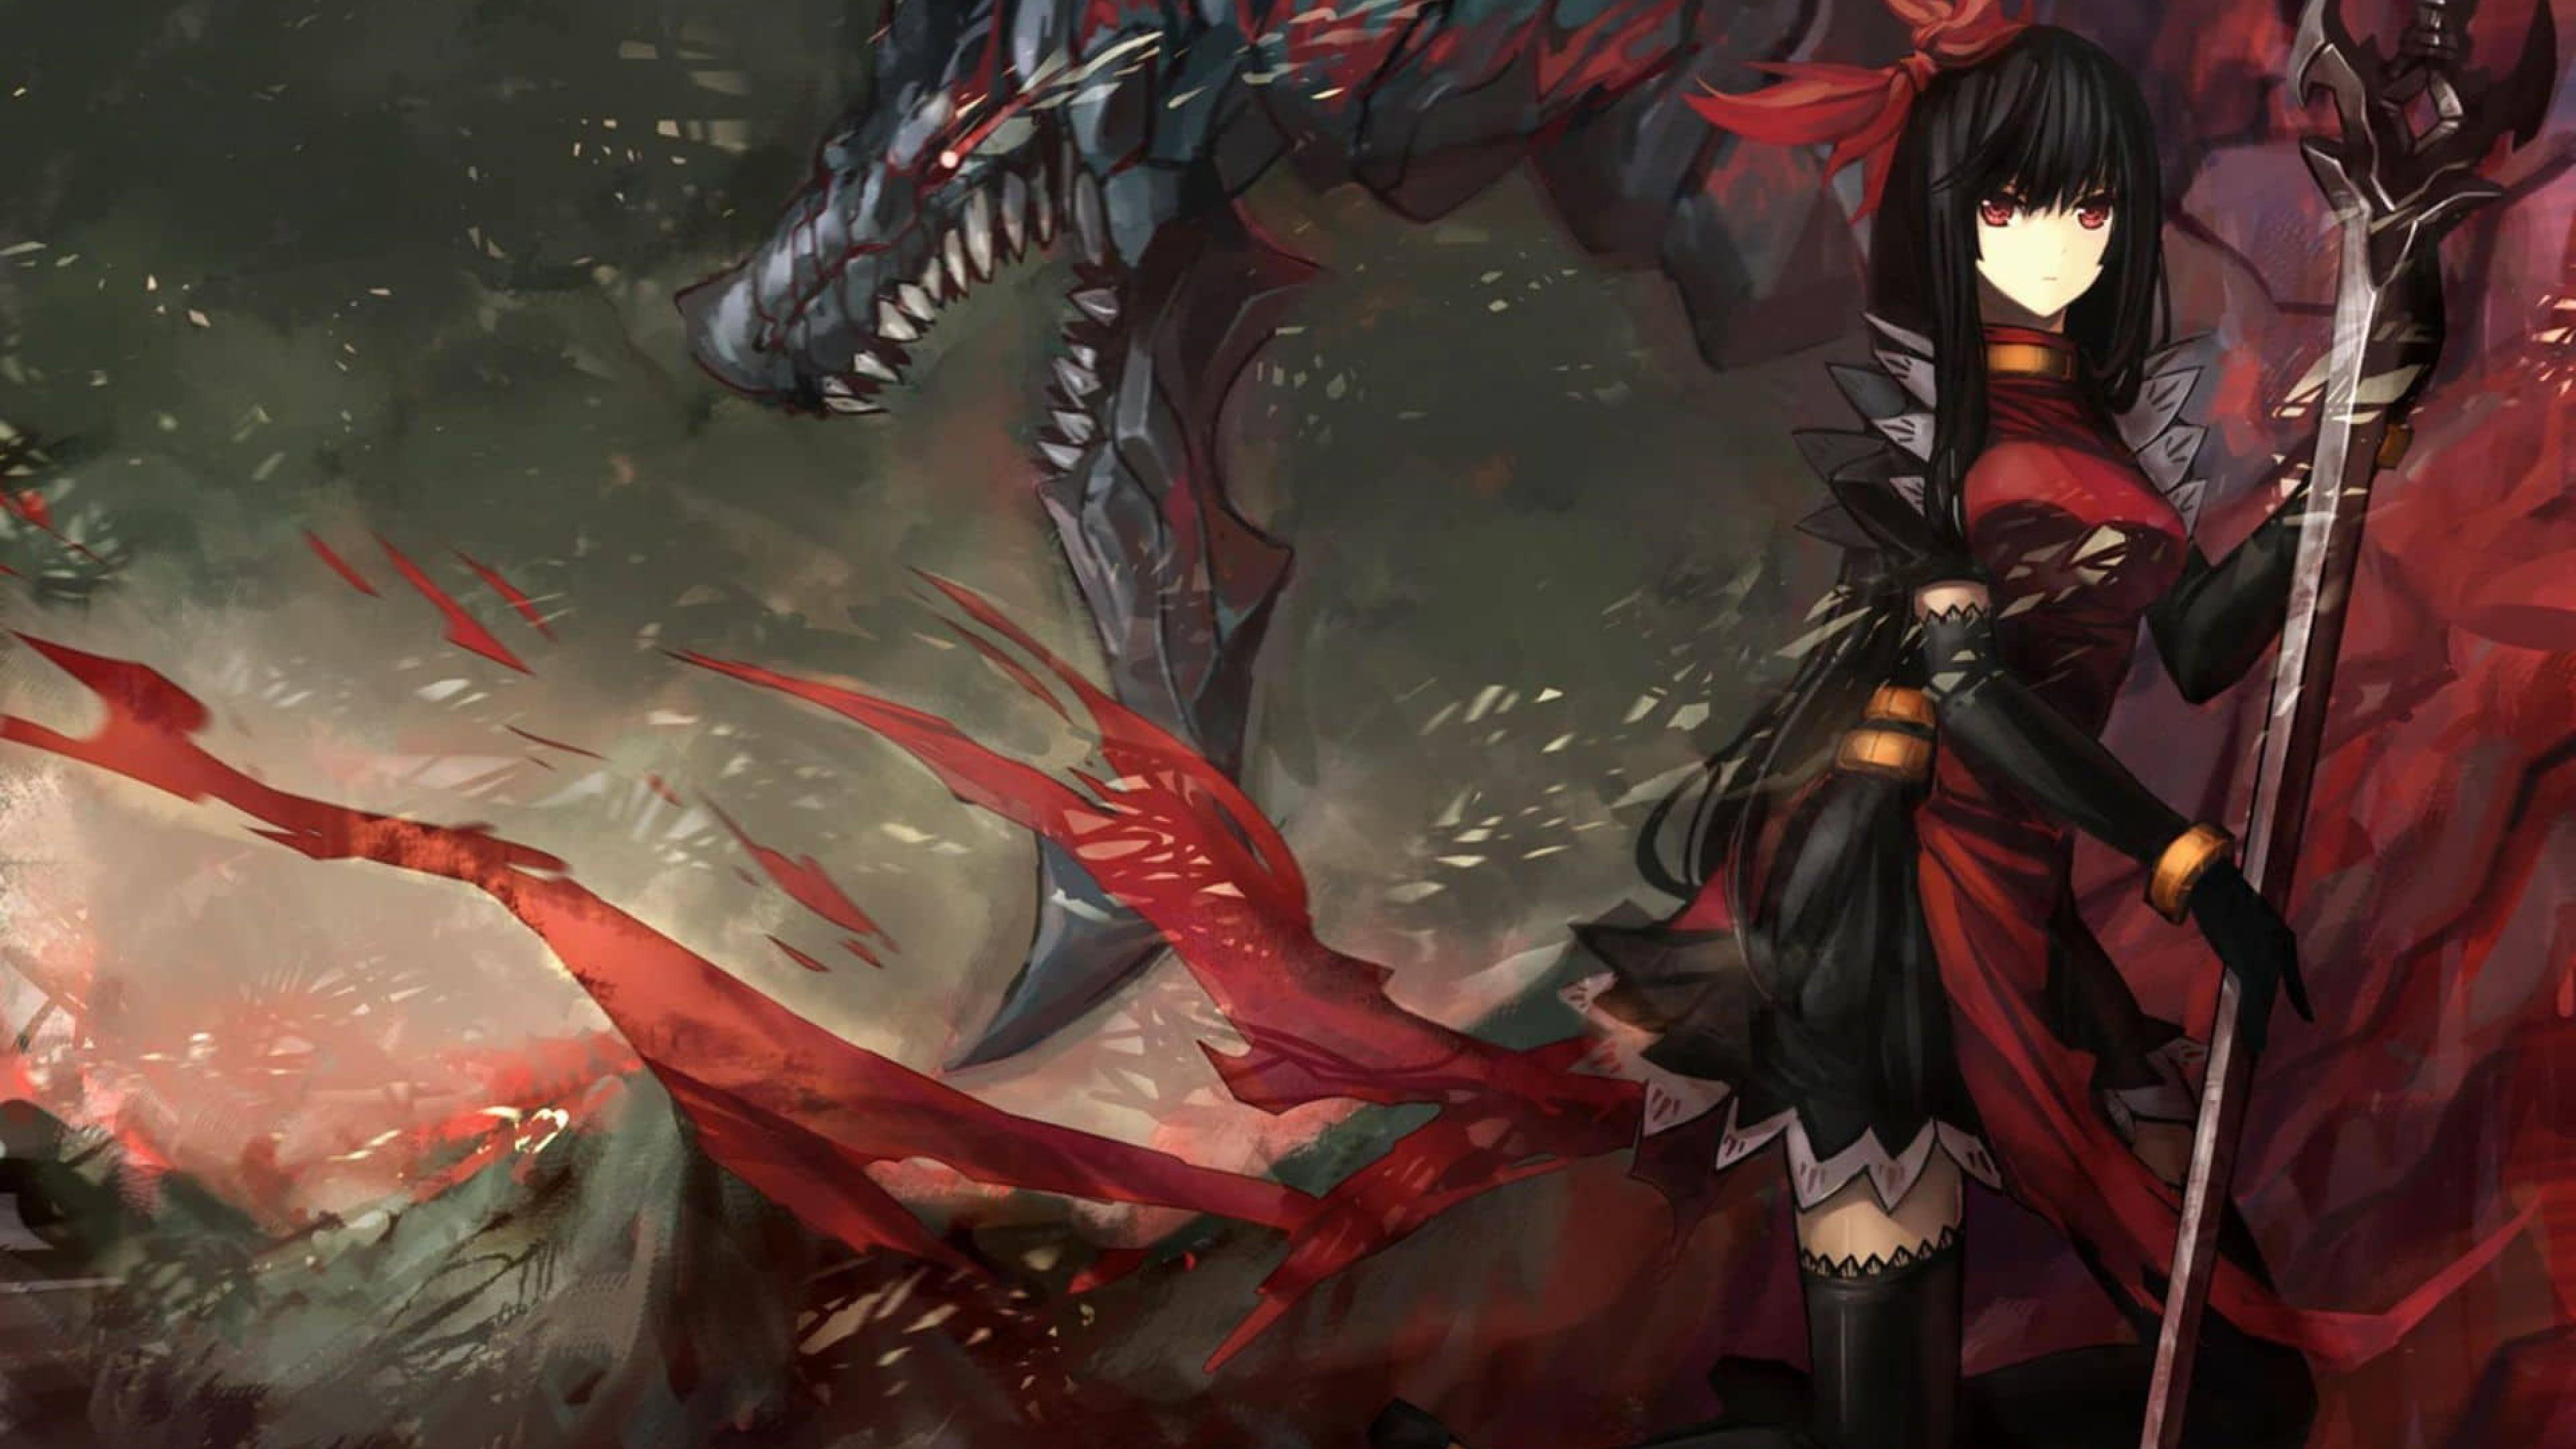 anime girl warrior wallpaper hd